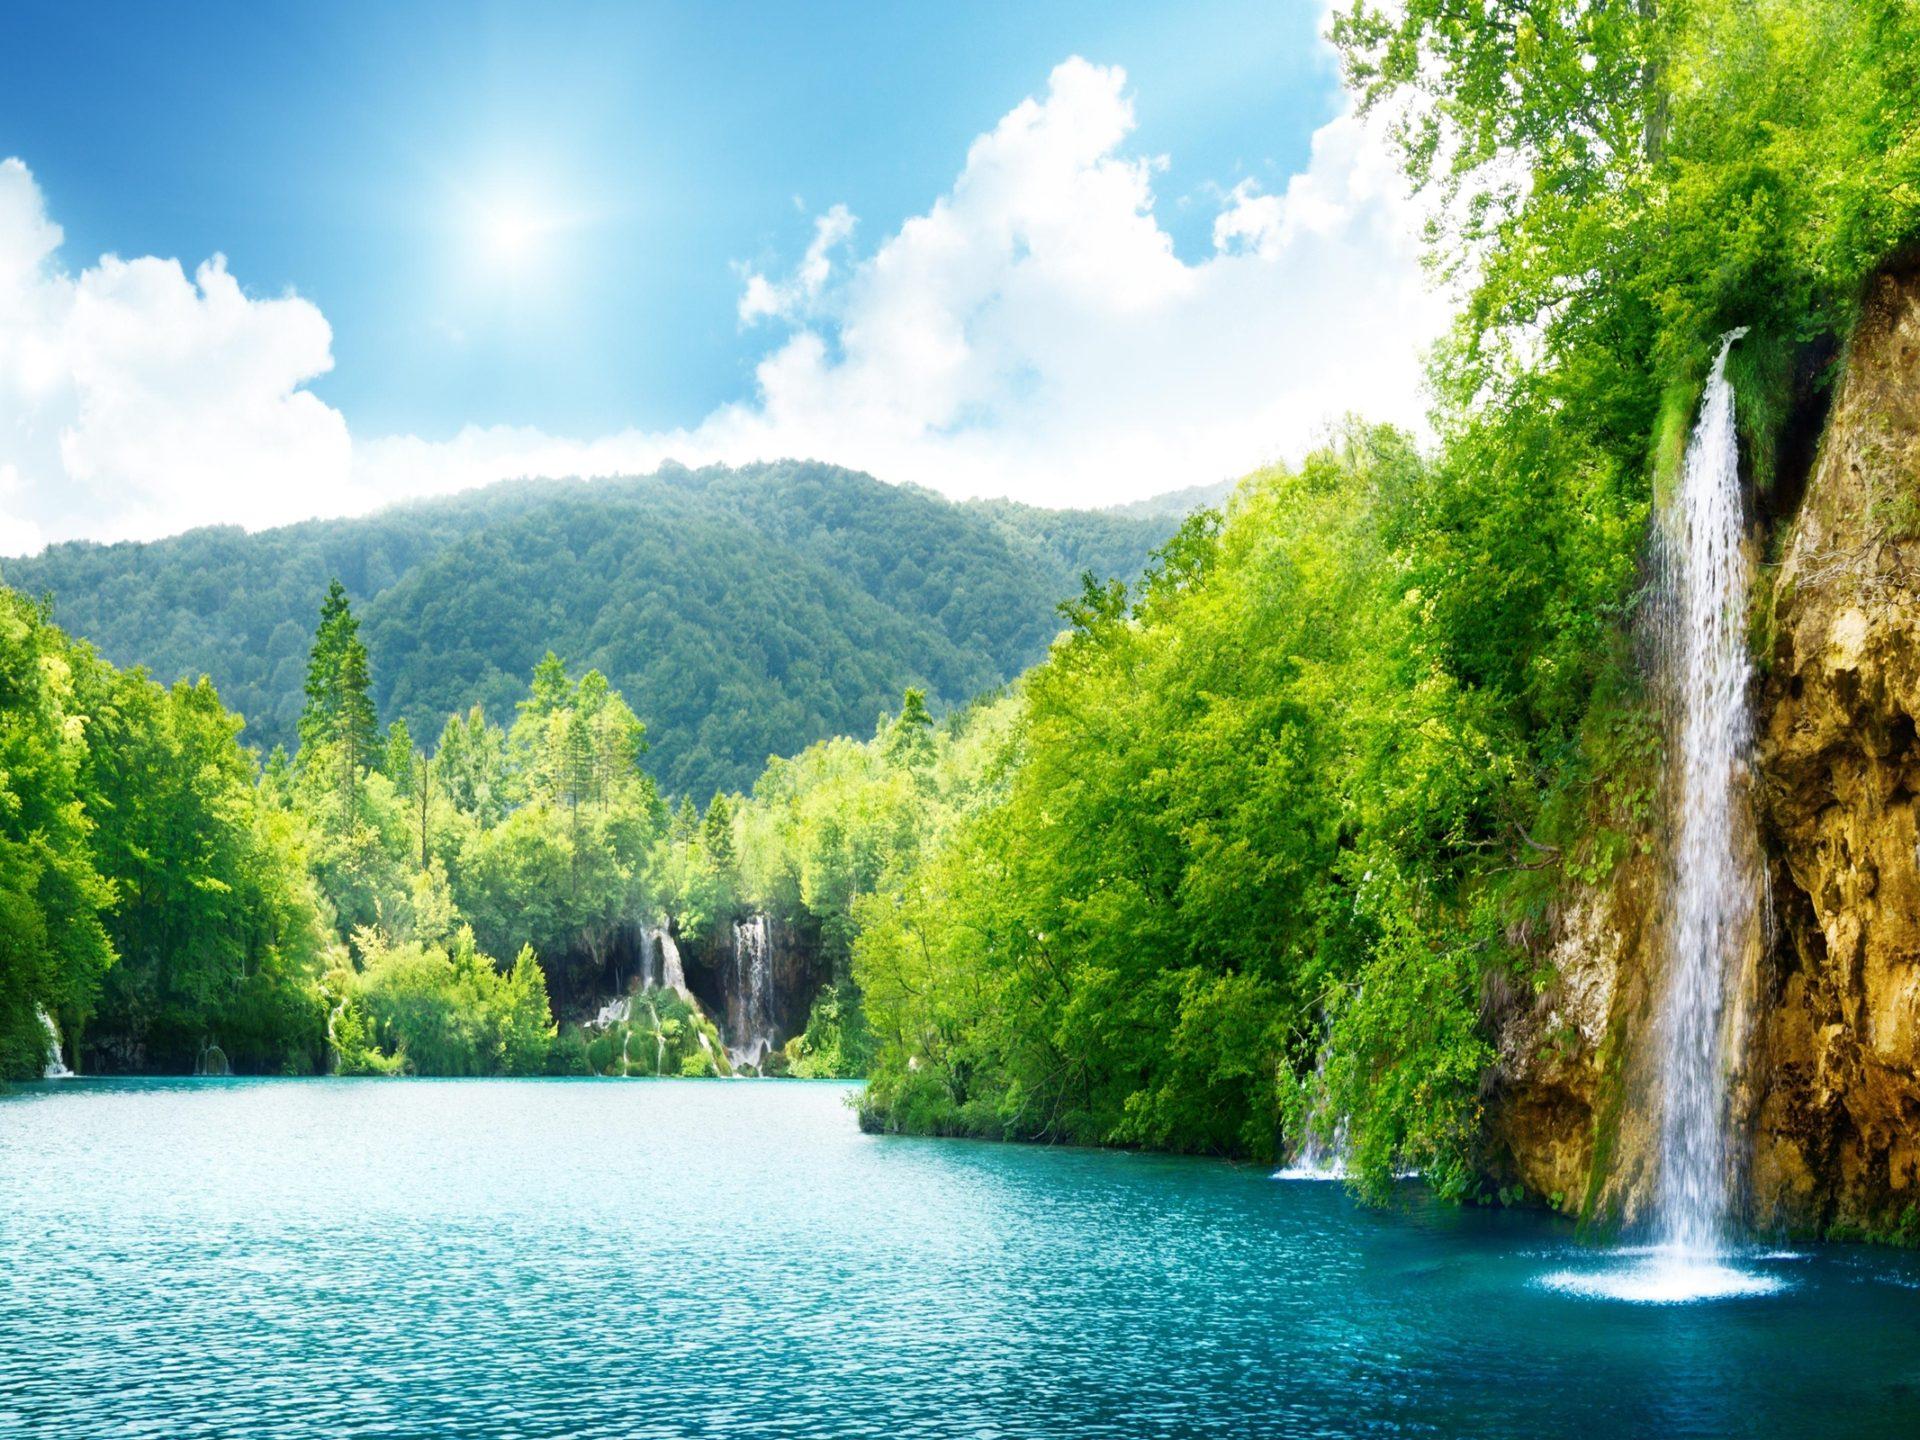 Diamond Iphone Wallpaper Hd Nature Waterfall Summer Lake Trees Hd Wallpaper 87432